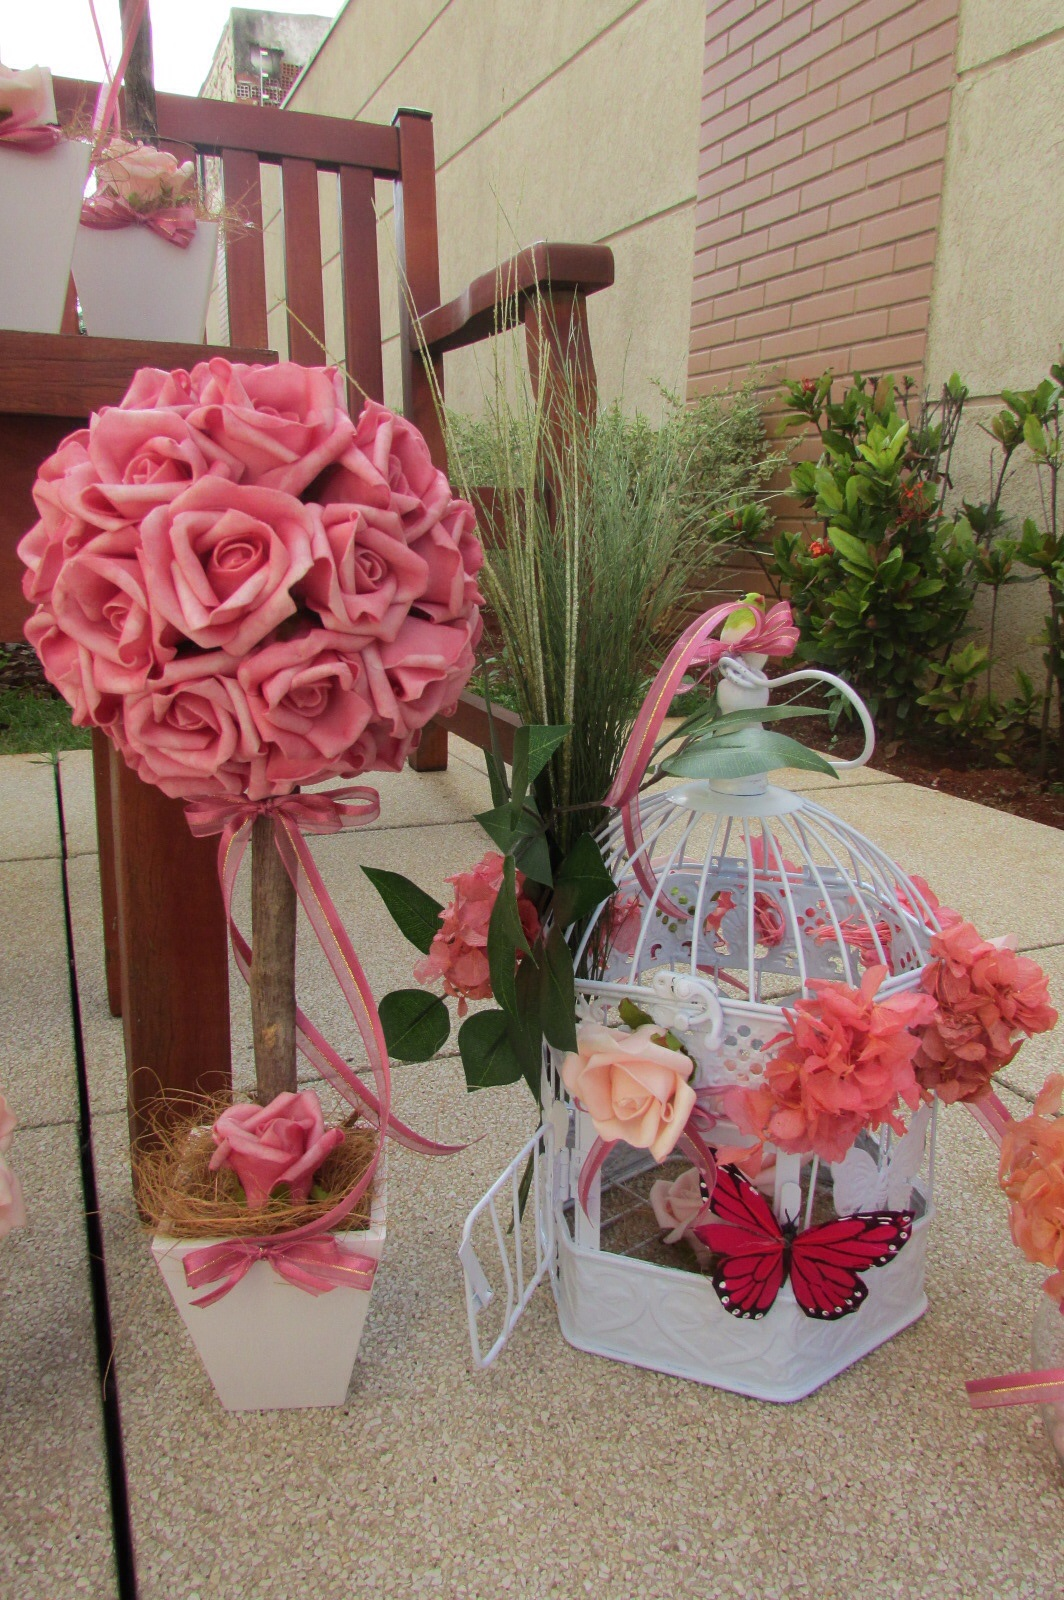 festa jardim encantado decoracao provencal:festa jardim encantado rosa e pink i mini casamento kit festa jardim